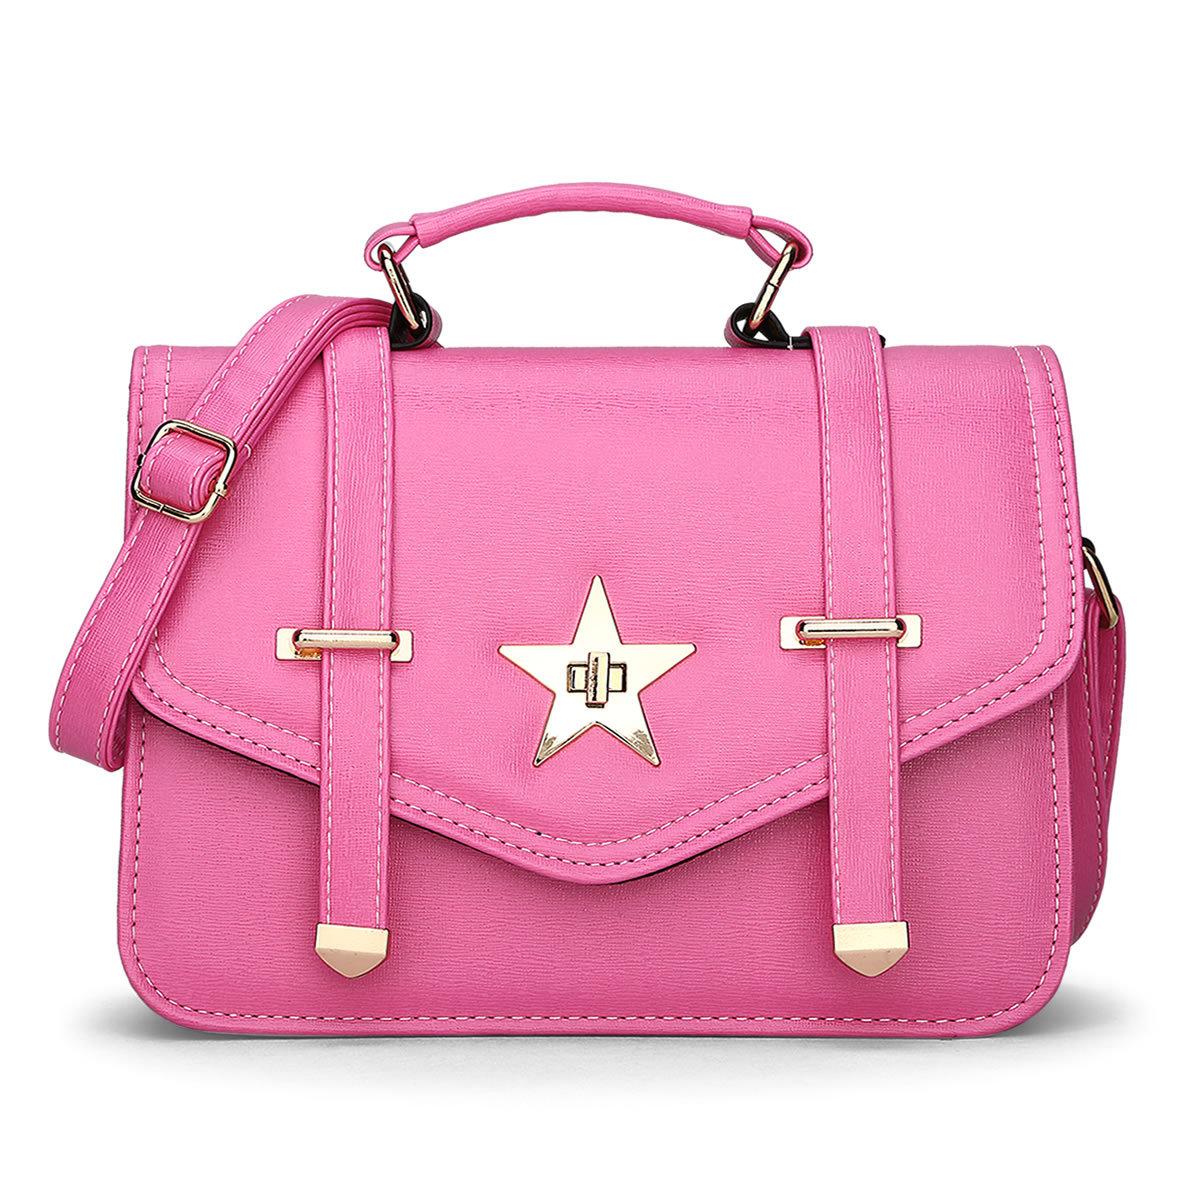 2016 New Design Summer Women Fashion Handbags Stars Tote Bag Small Party Single Shoulder Bag Leather Messenger Bags(China (Mainland))